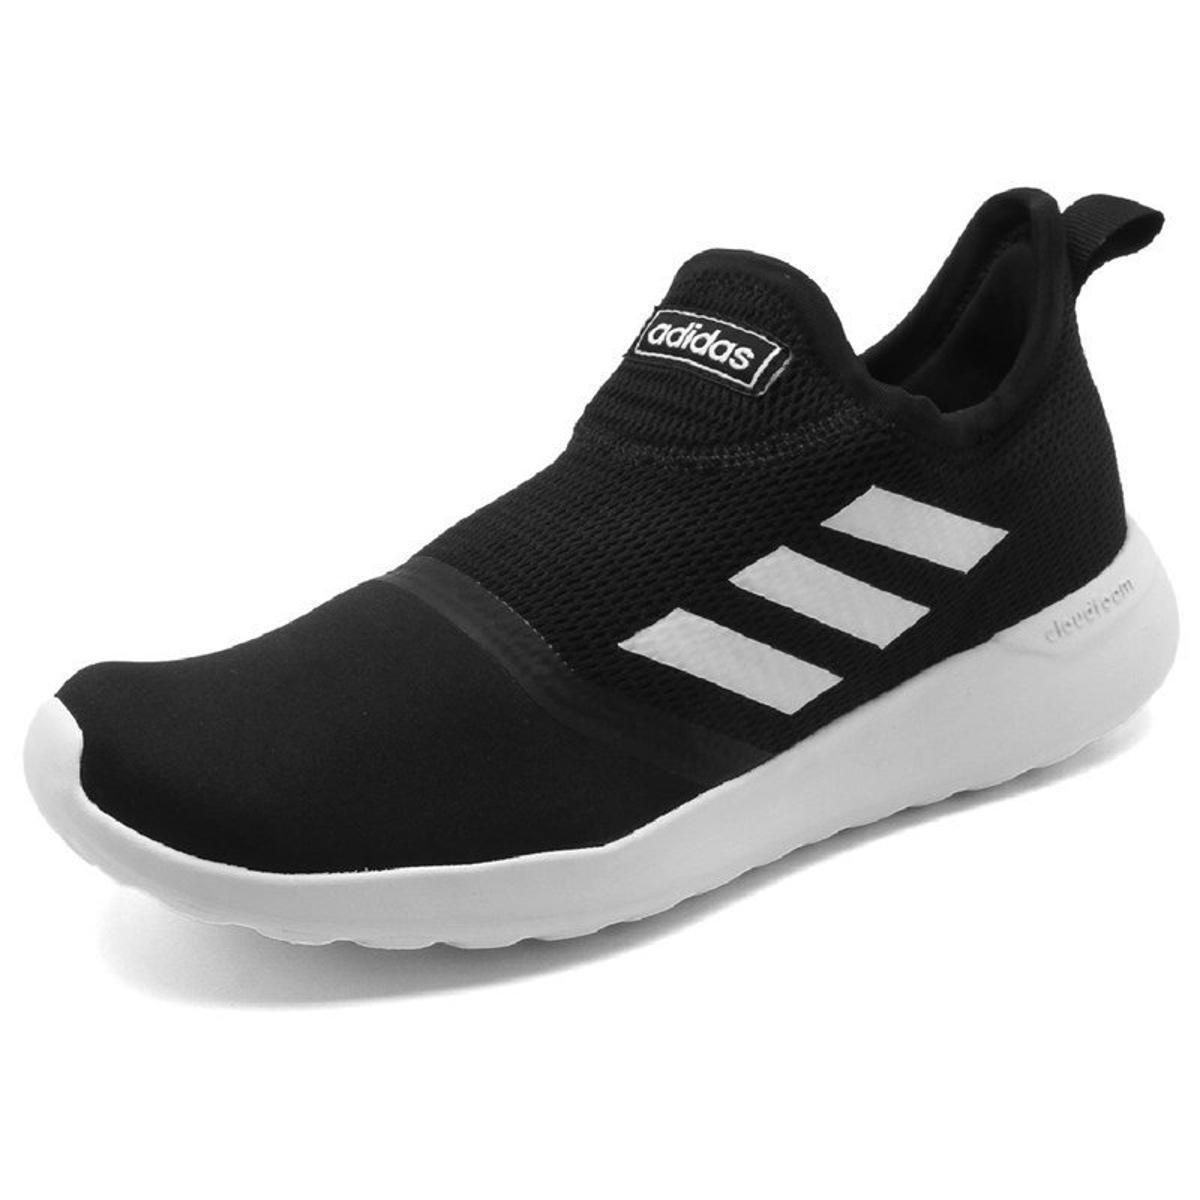 0287be359 Tenis Adidas Lite Racer Slipon | Preto/branco | Coutope